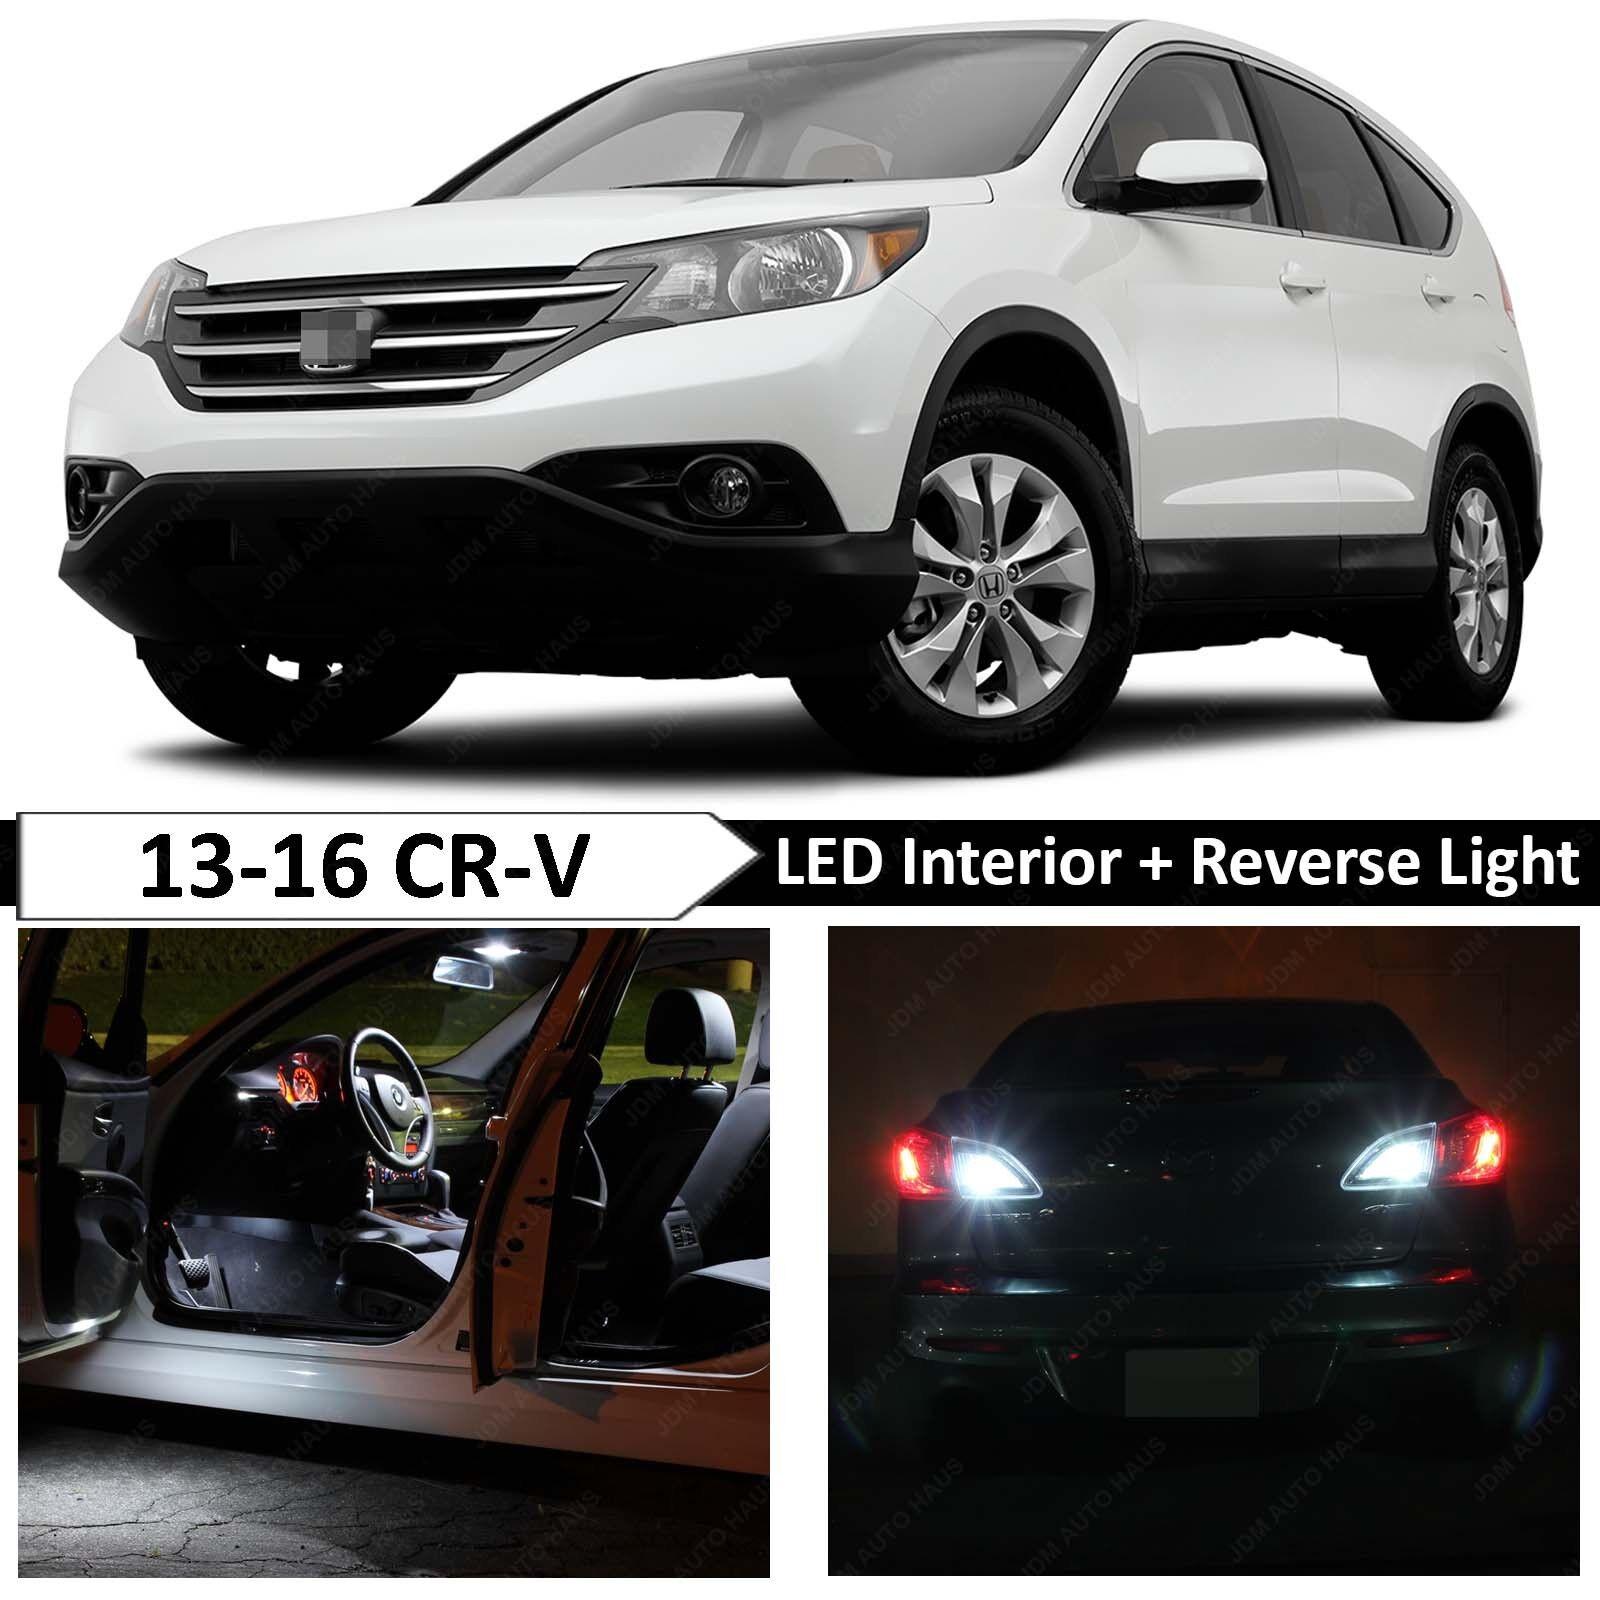 17x White Interior Reverse Backup LED Light Bulbs Fits 2014 2015 Honda Odyssey